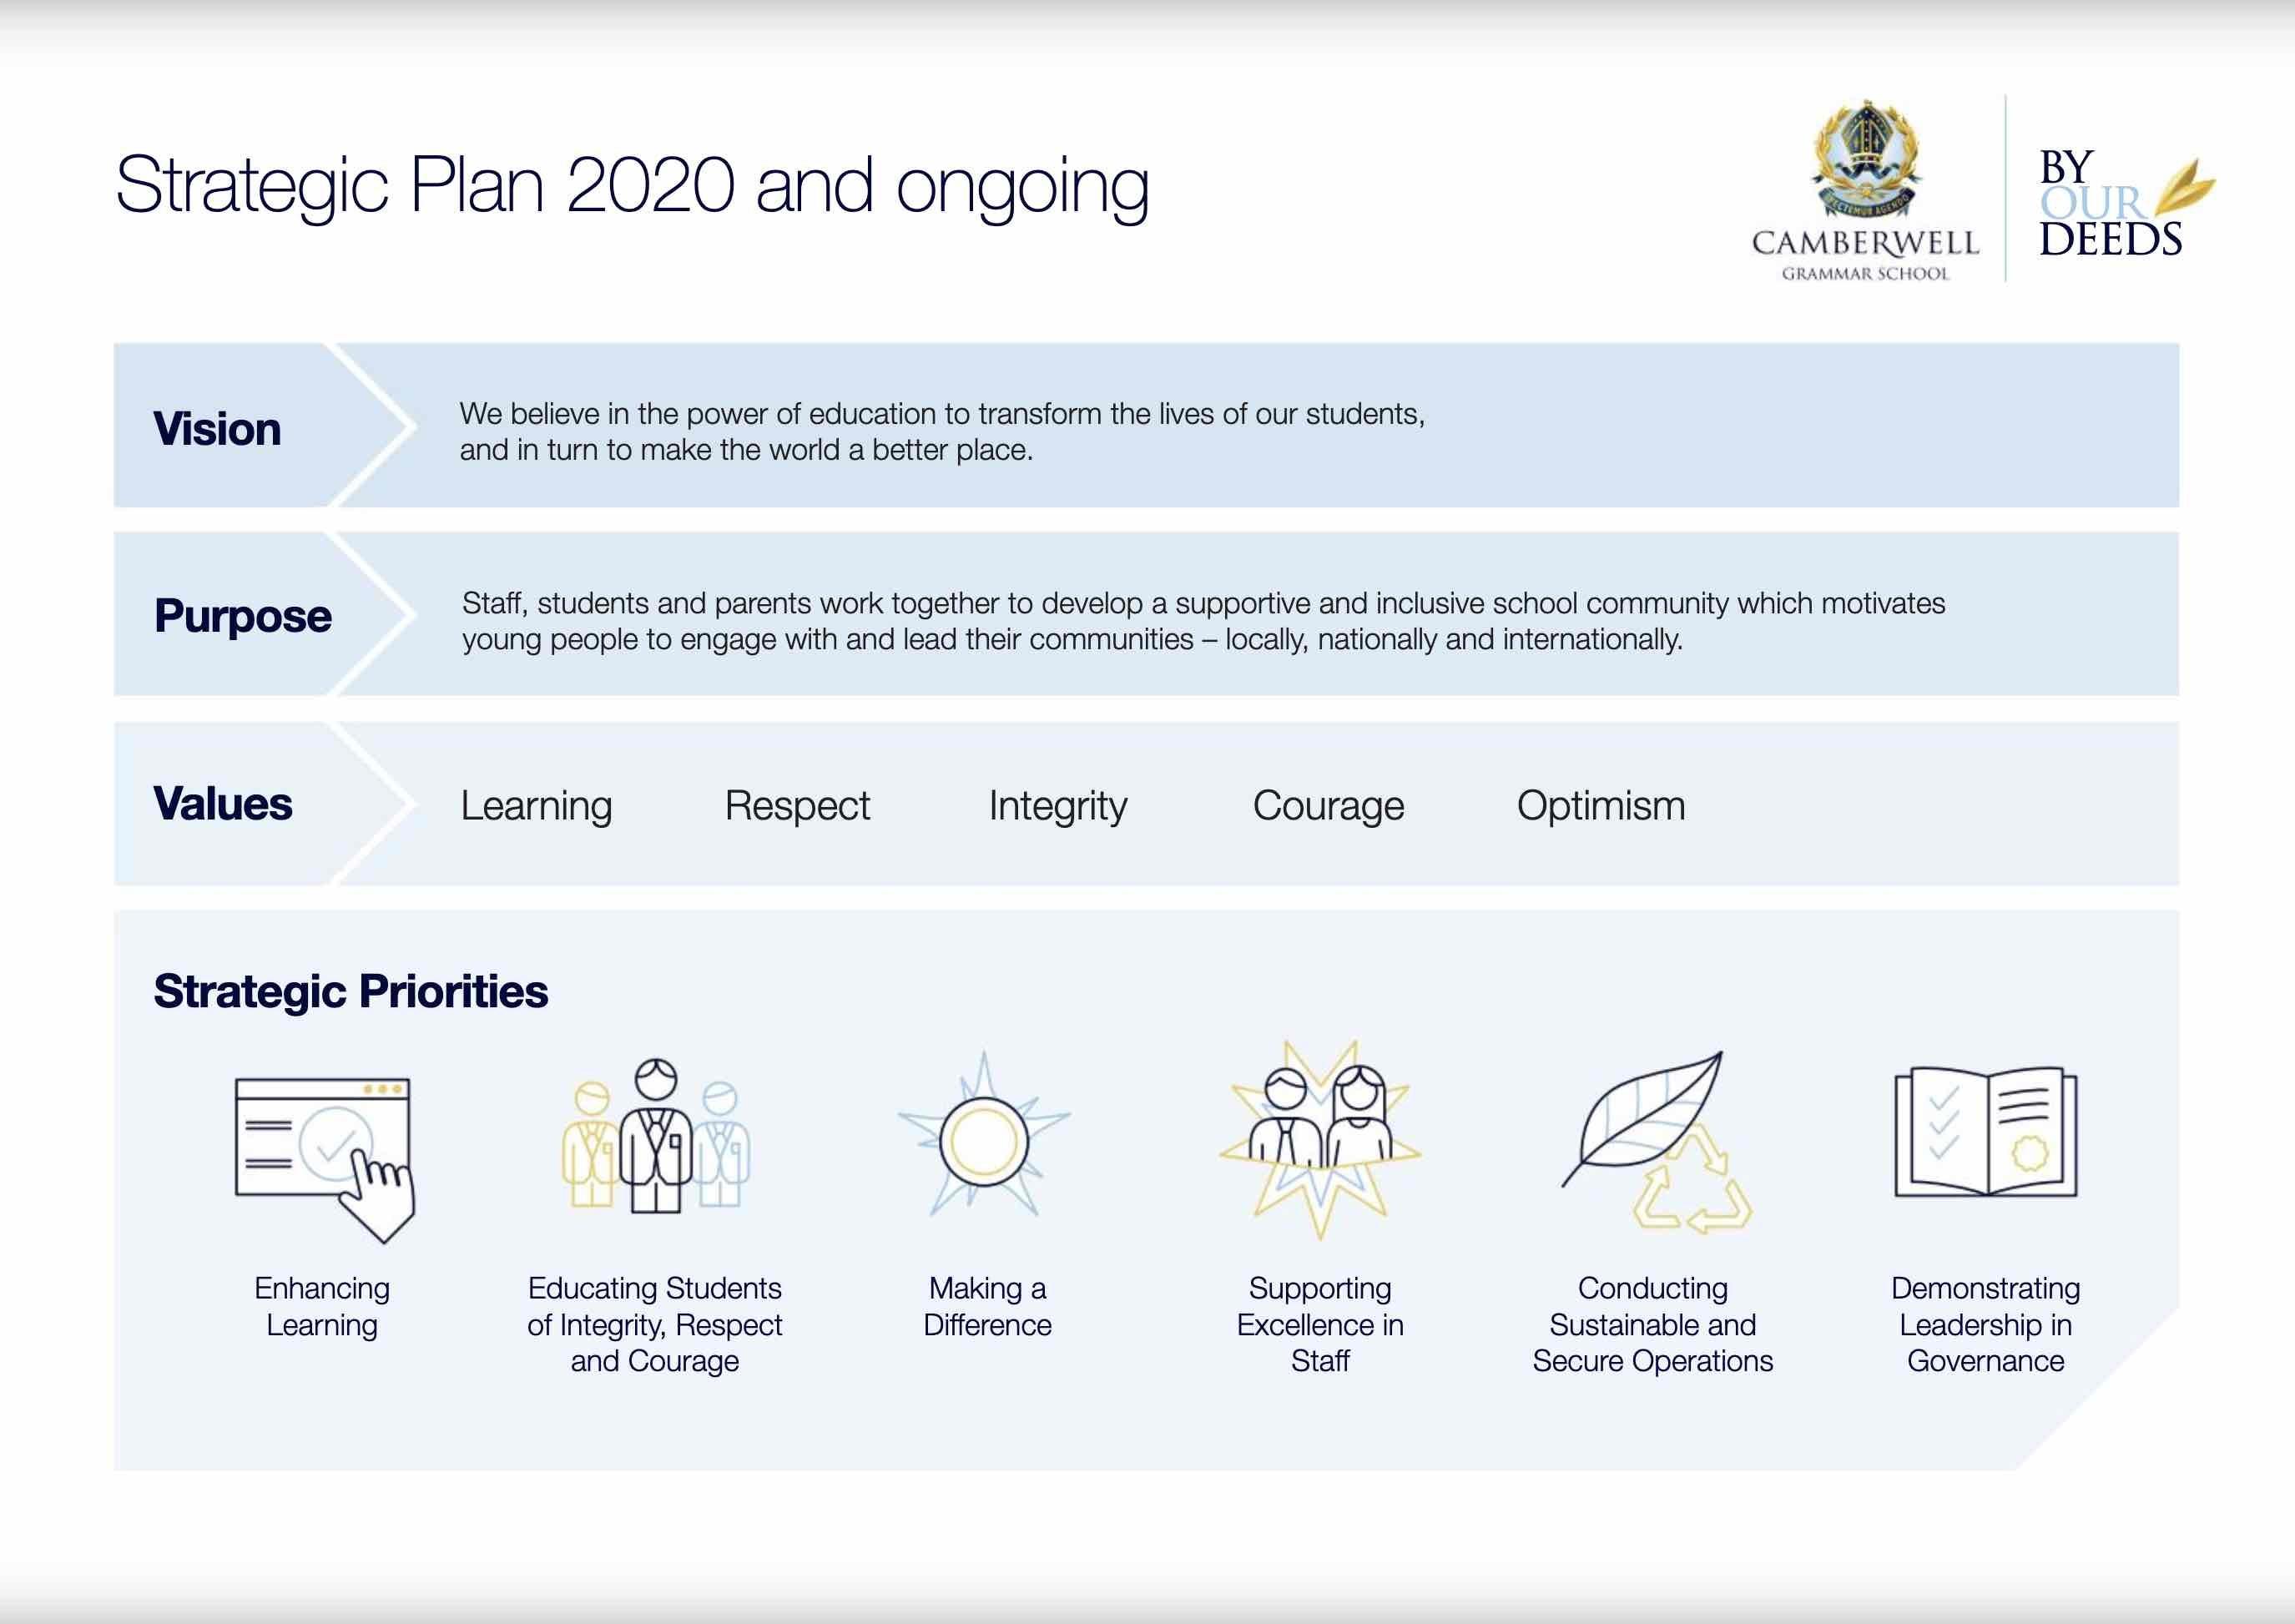 Strategic Plan 2020 and beyond